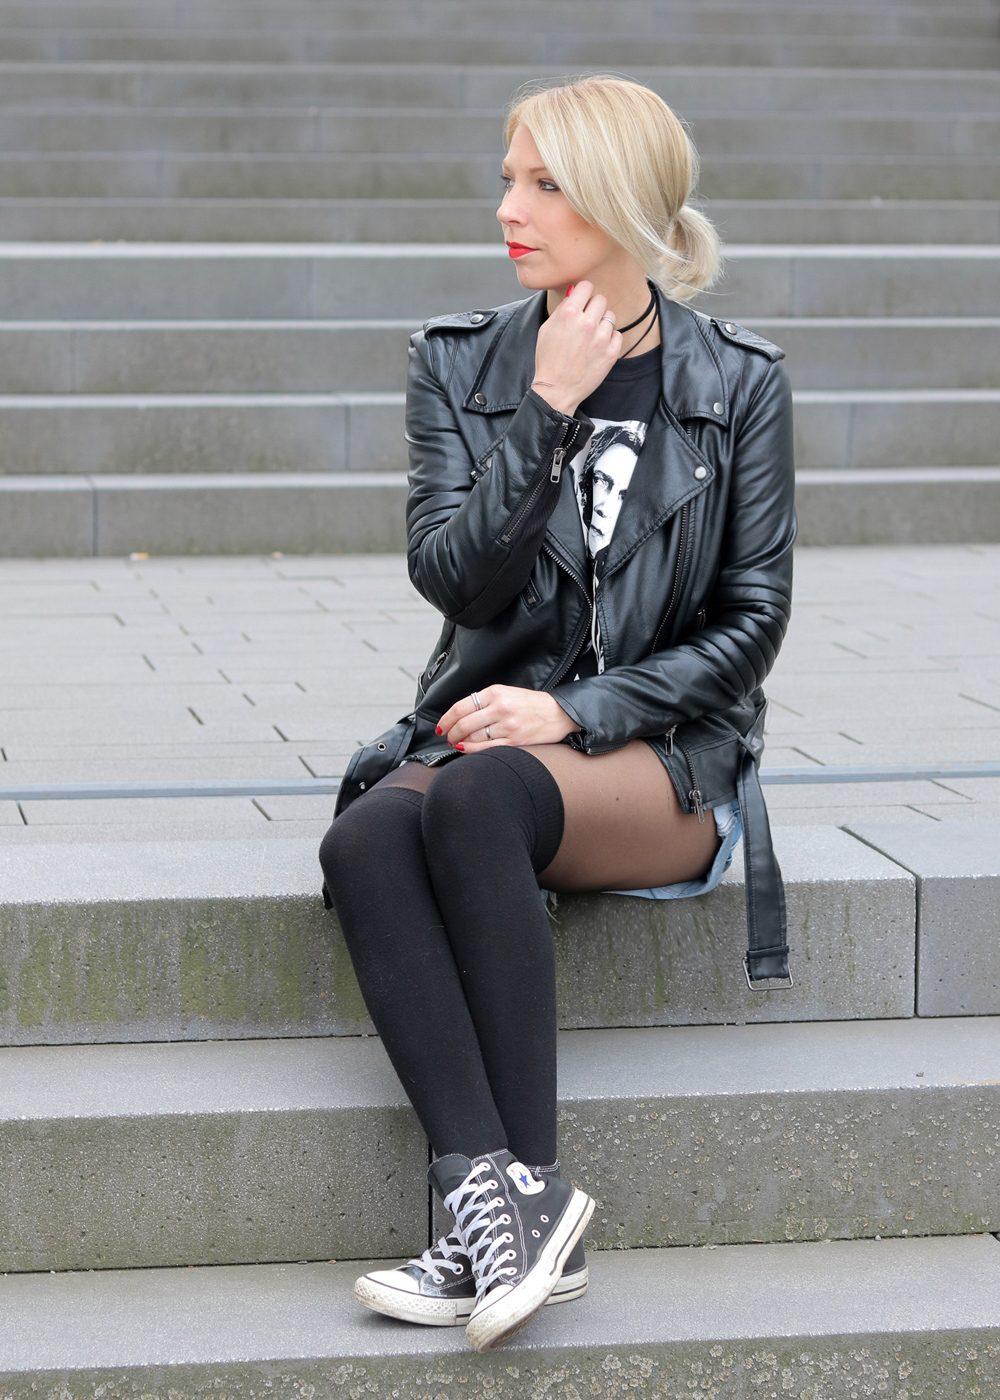 fashionblogger-heidelberg-outfit-shirt-snape-jeansshorts-chucks-lederjacke-4-von-15